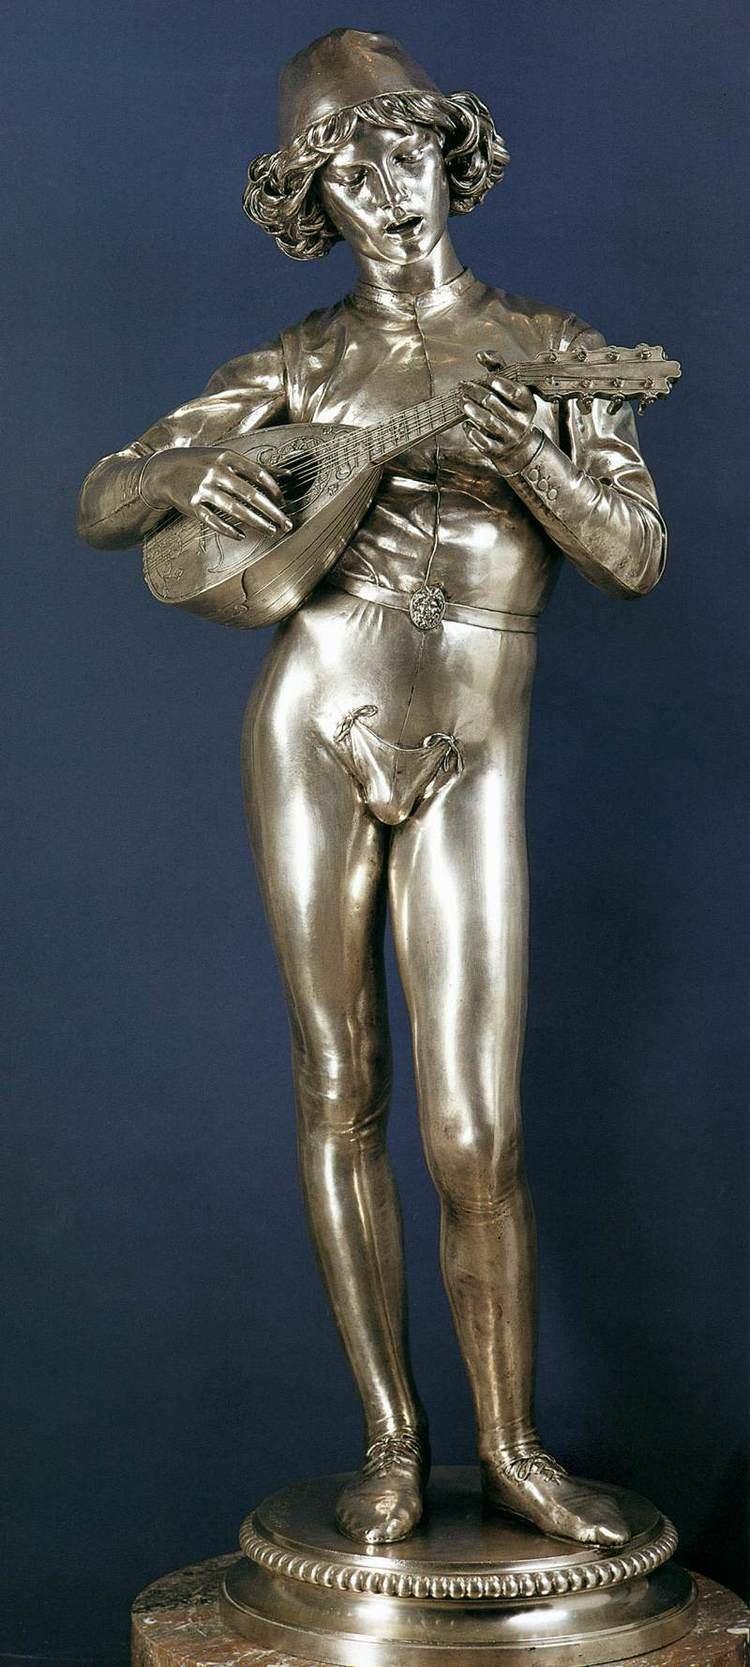 Paul Dubois (sculptor) Florentine Singer by DUBOIS Paul